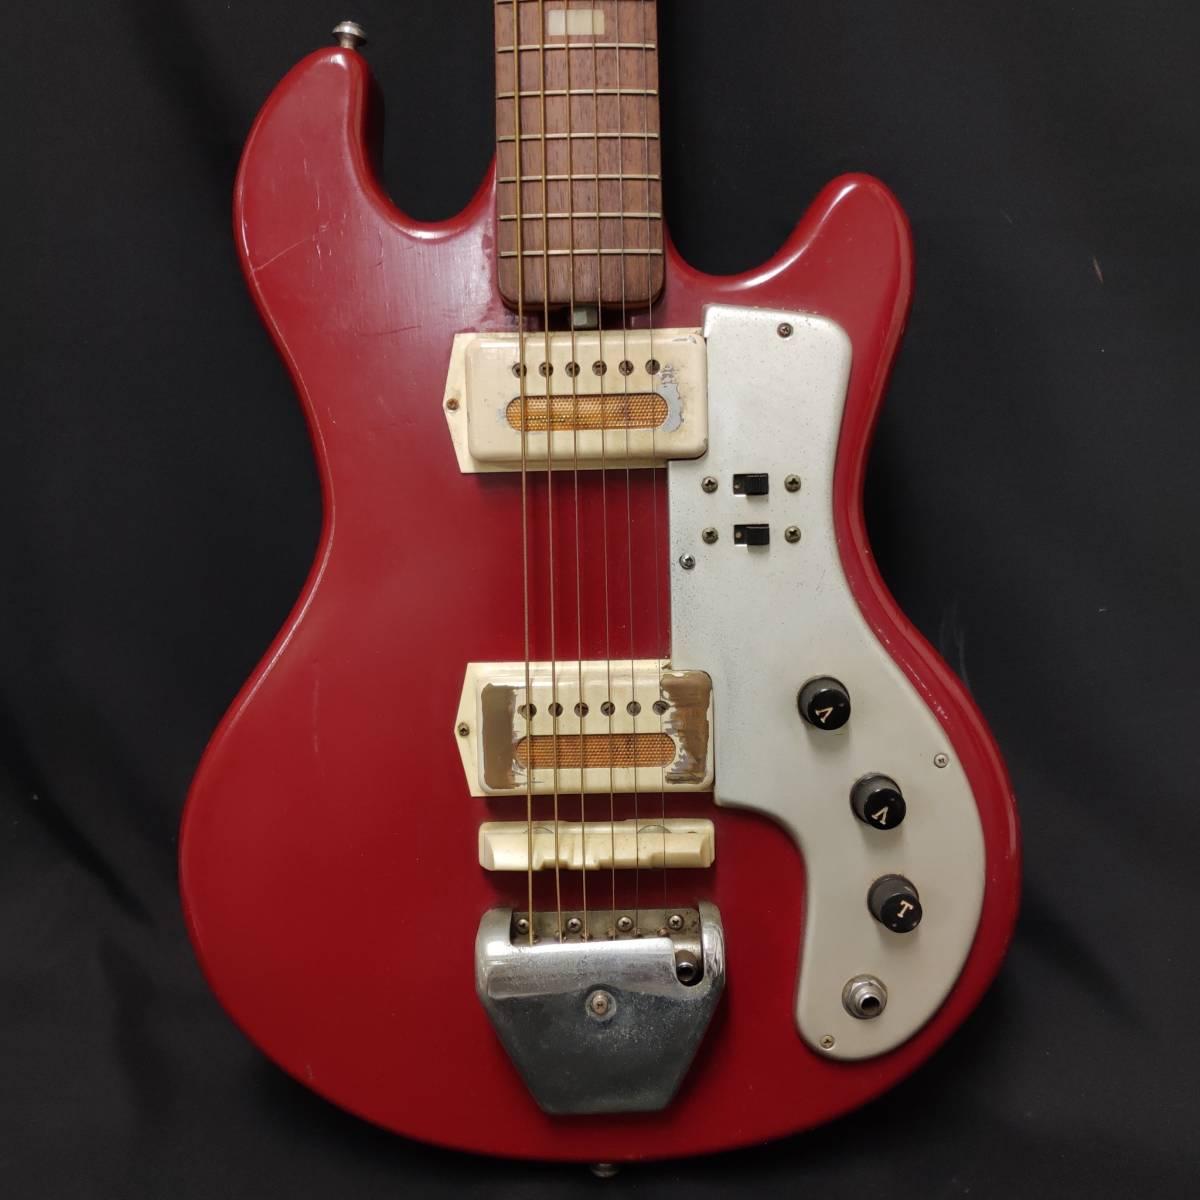 A22m11T GUYA TONE エレキギター LG-85T 本体 約100cm グヤトーン ビンテージ レッド 赤色_画像4